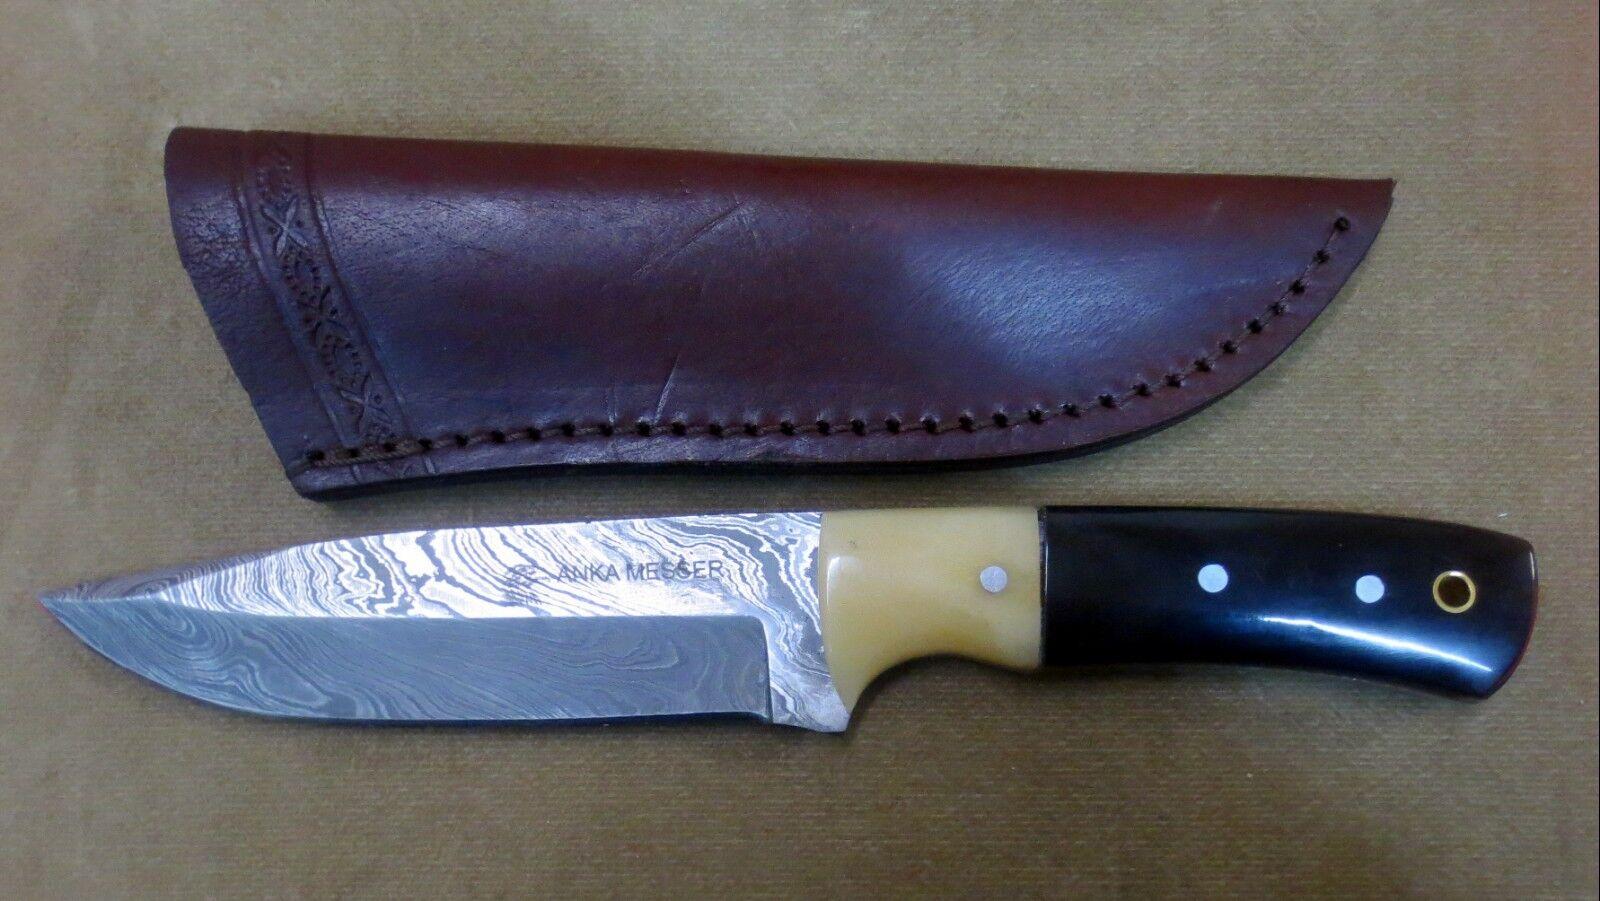 Anka Messer - Damaststahl-Taschen-Jagdmesser  Bullhorn Gürtel Leder-Scheide